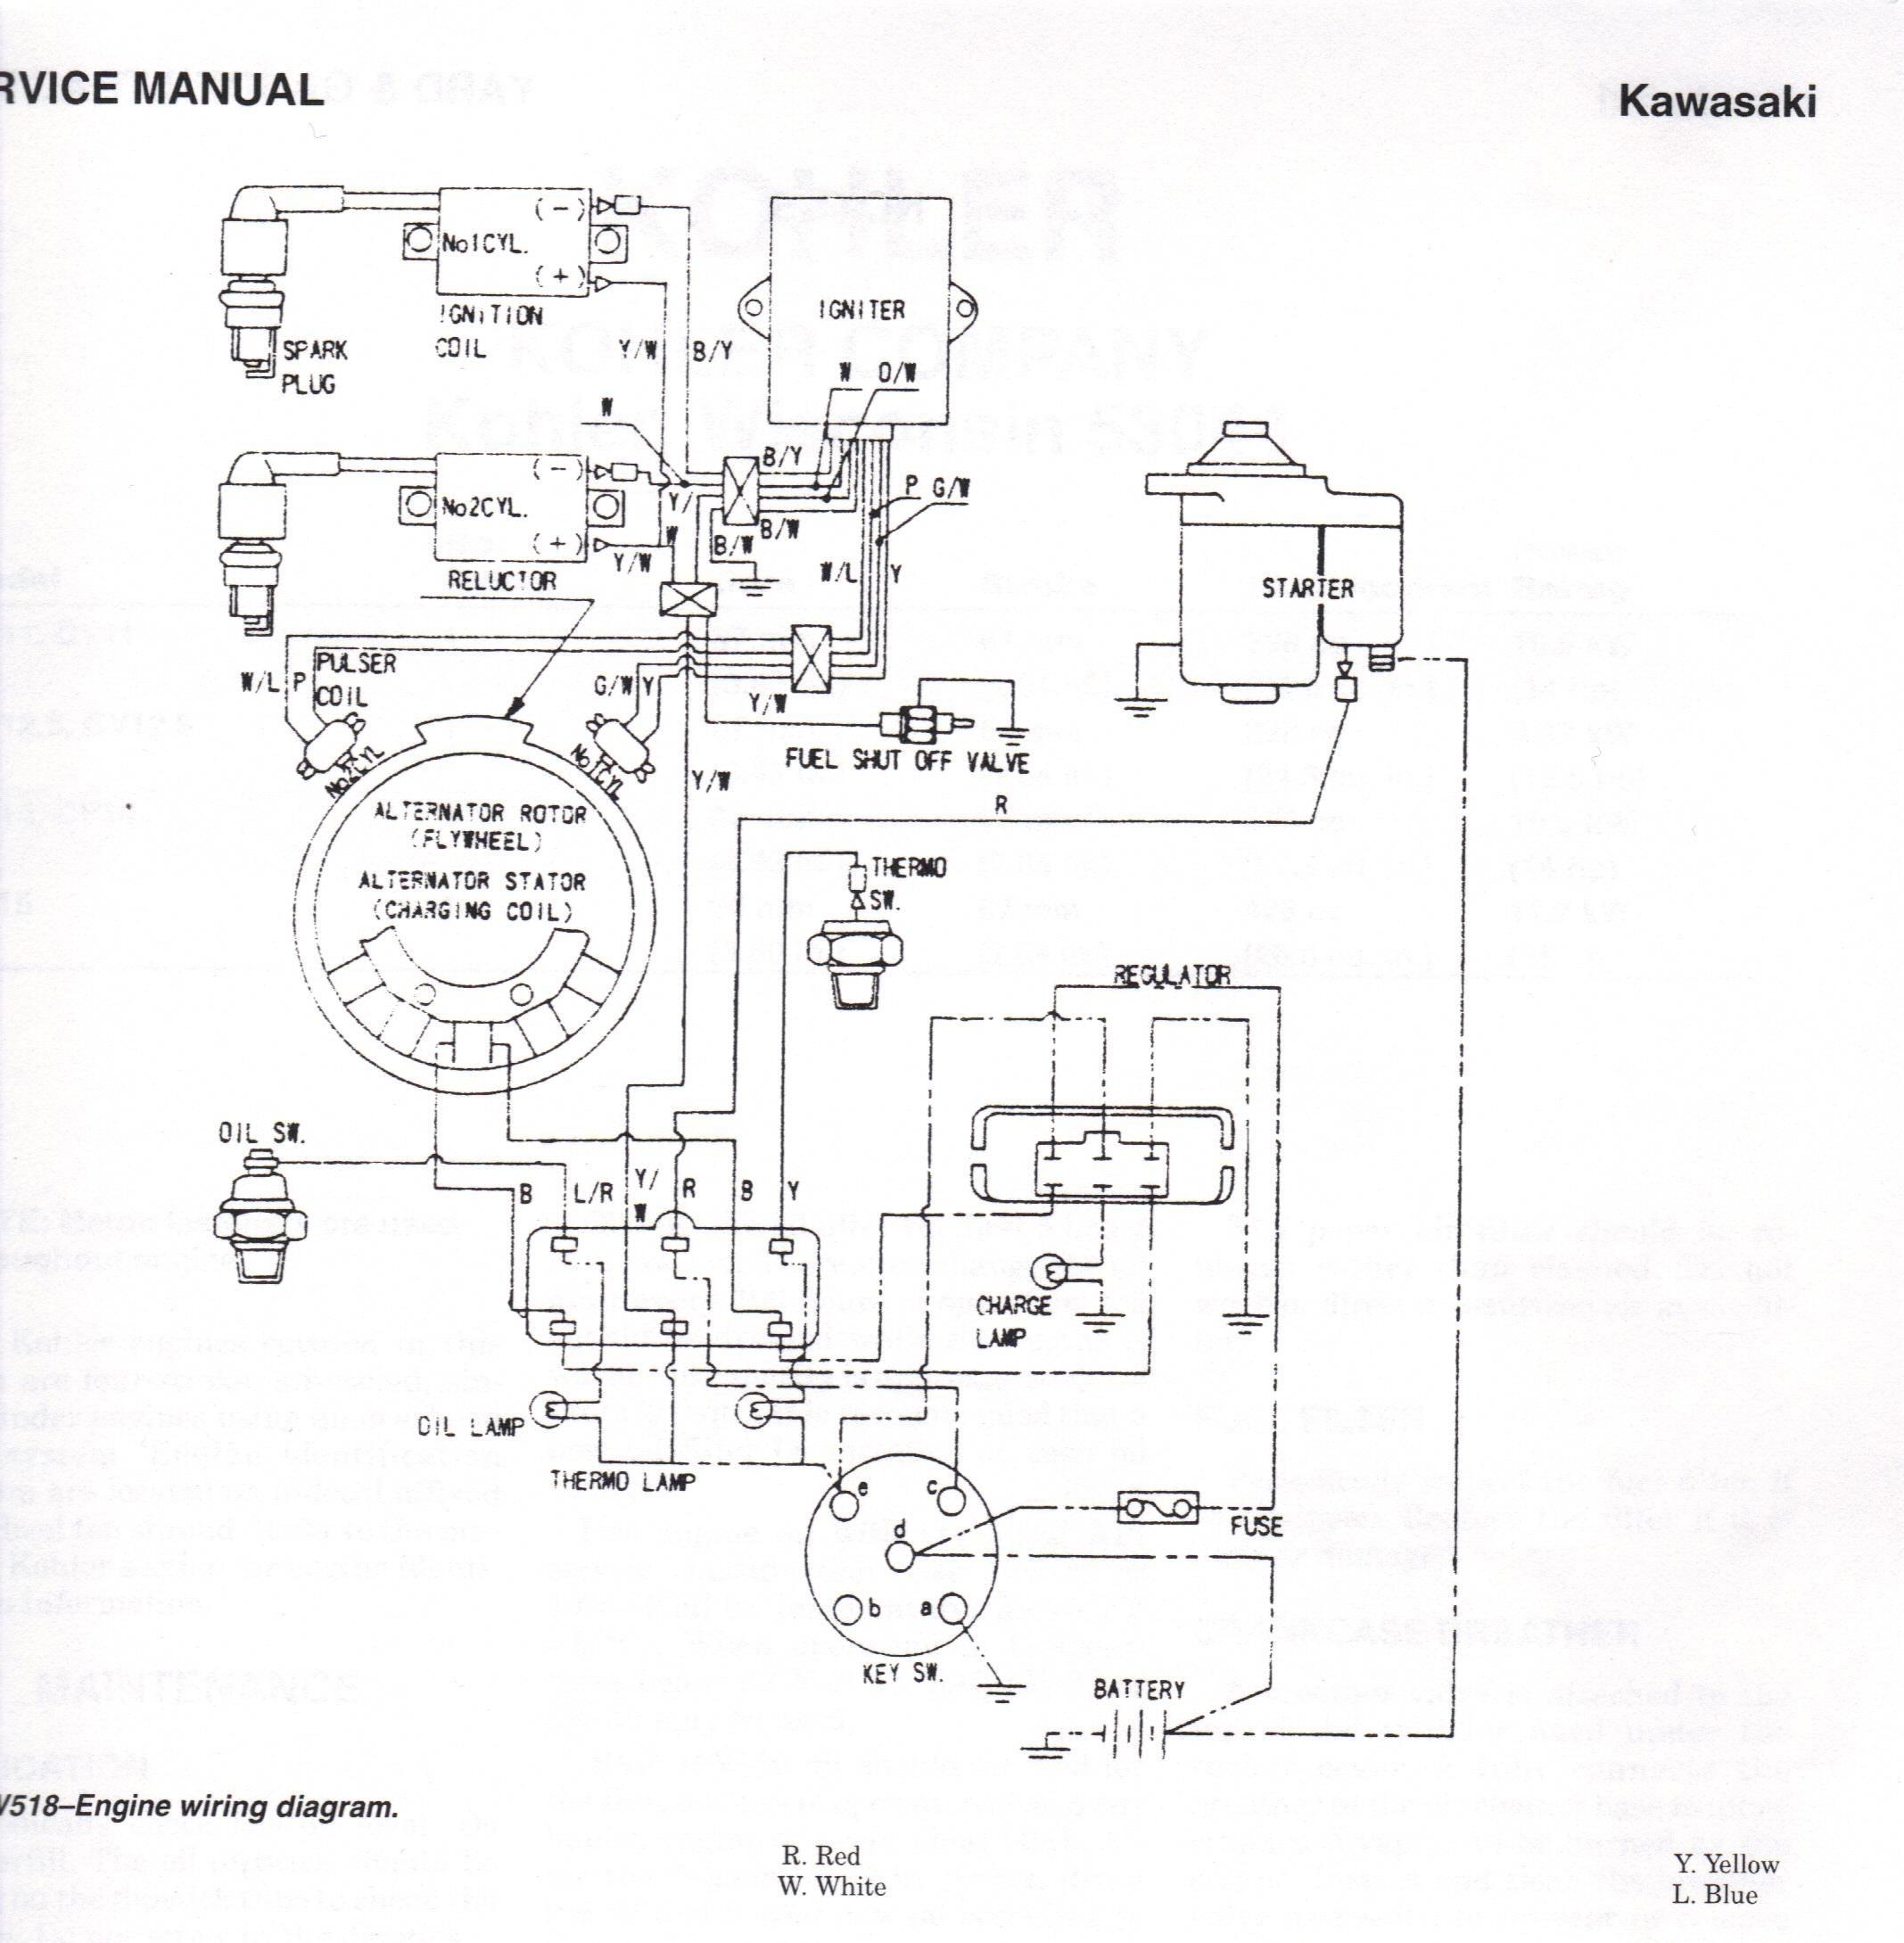 John Deere 650g Wiring Diagram